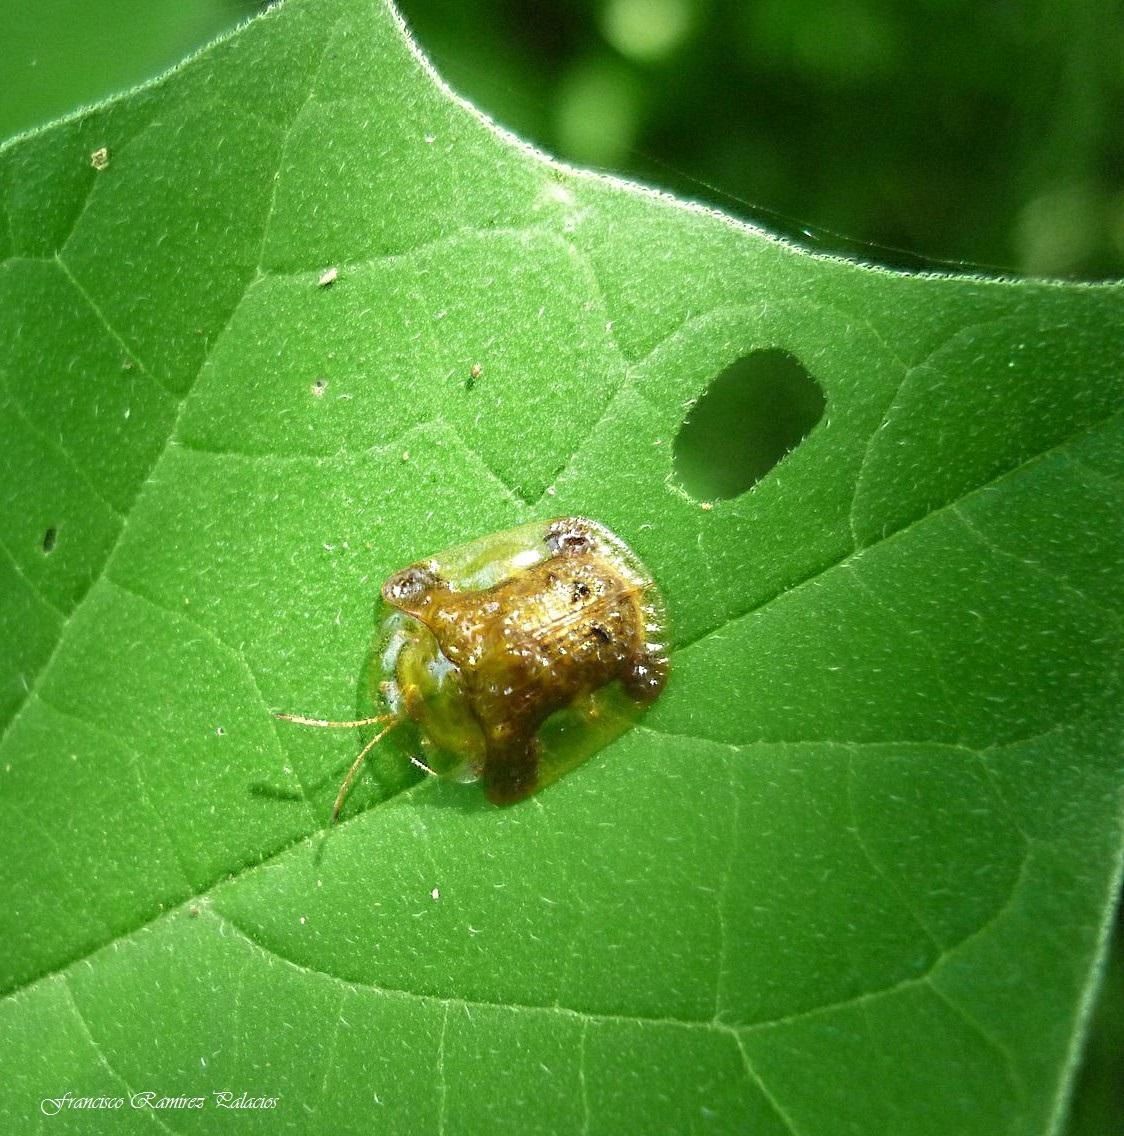 The Clavate Tortoise Beetle